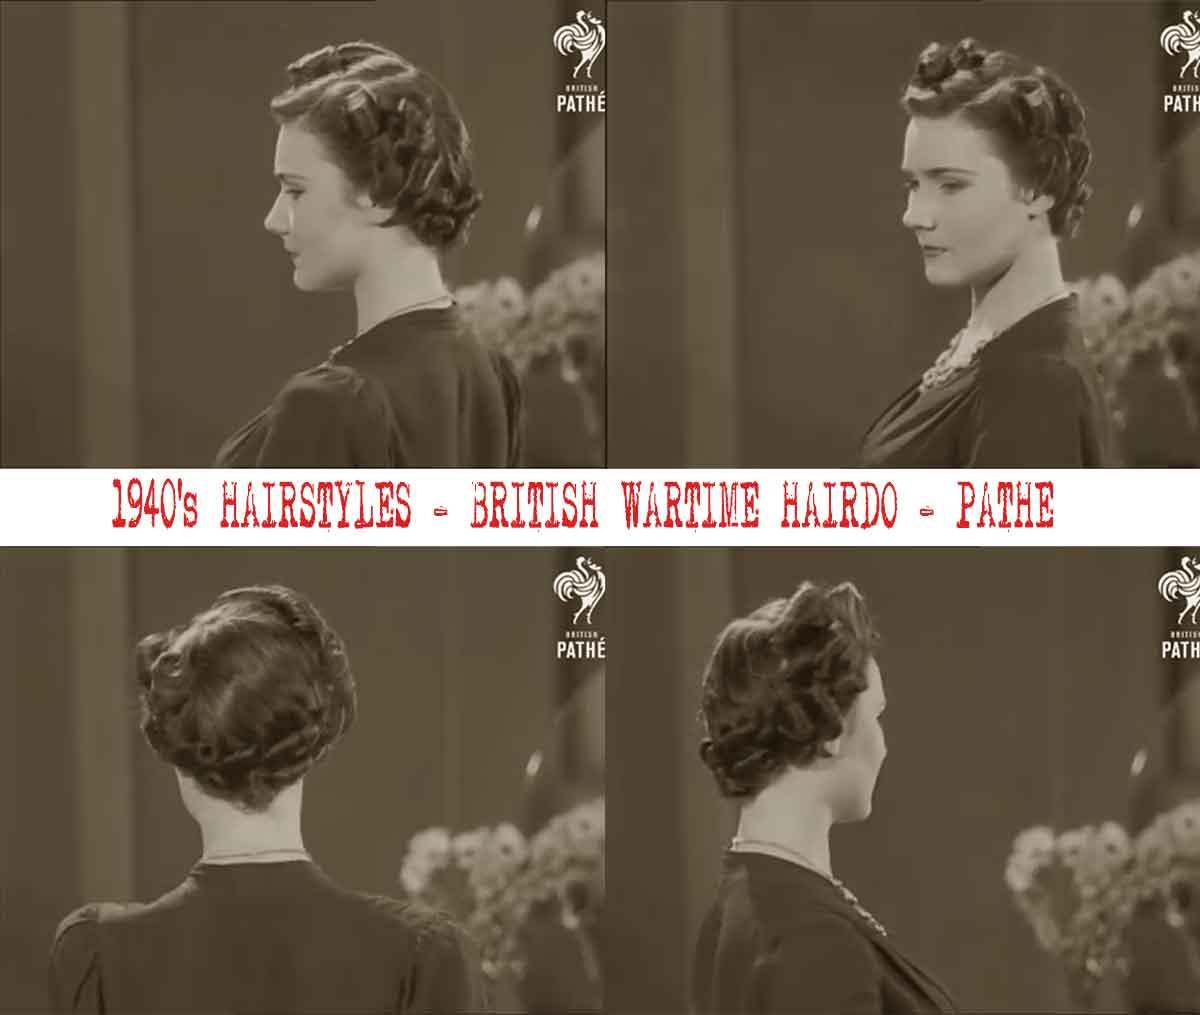 1940s-hairstyles-british-wartime-hairdo